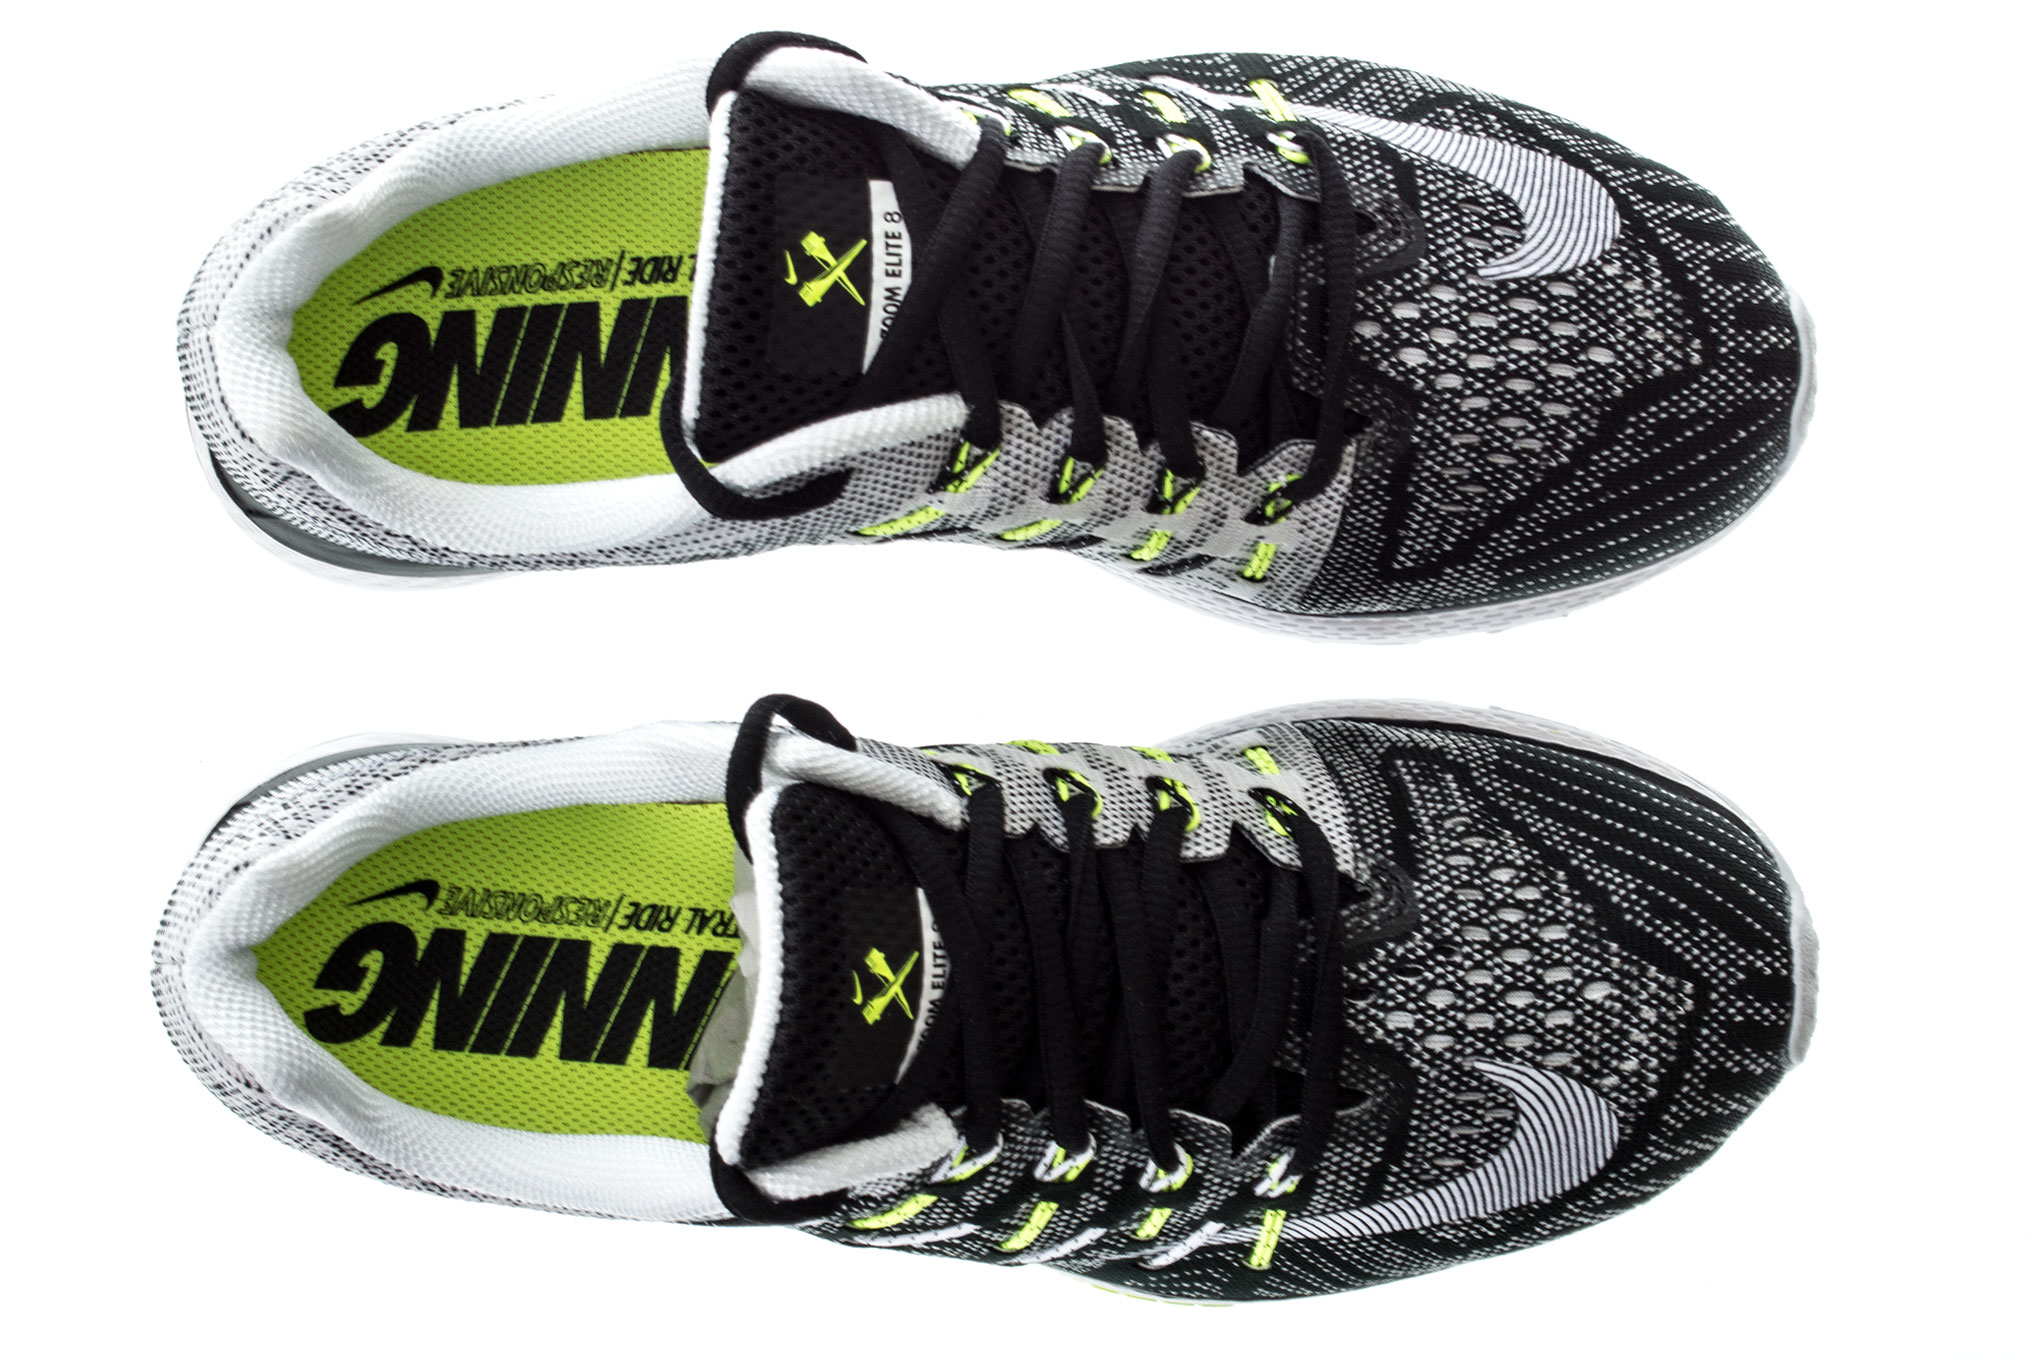 new concept e1bc2 925a0 NIKE Shoes AIR ZOOM ELITE 8 CP White Black Men